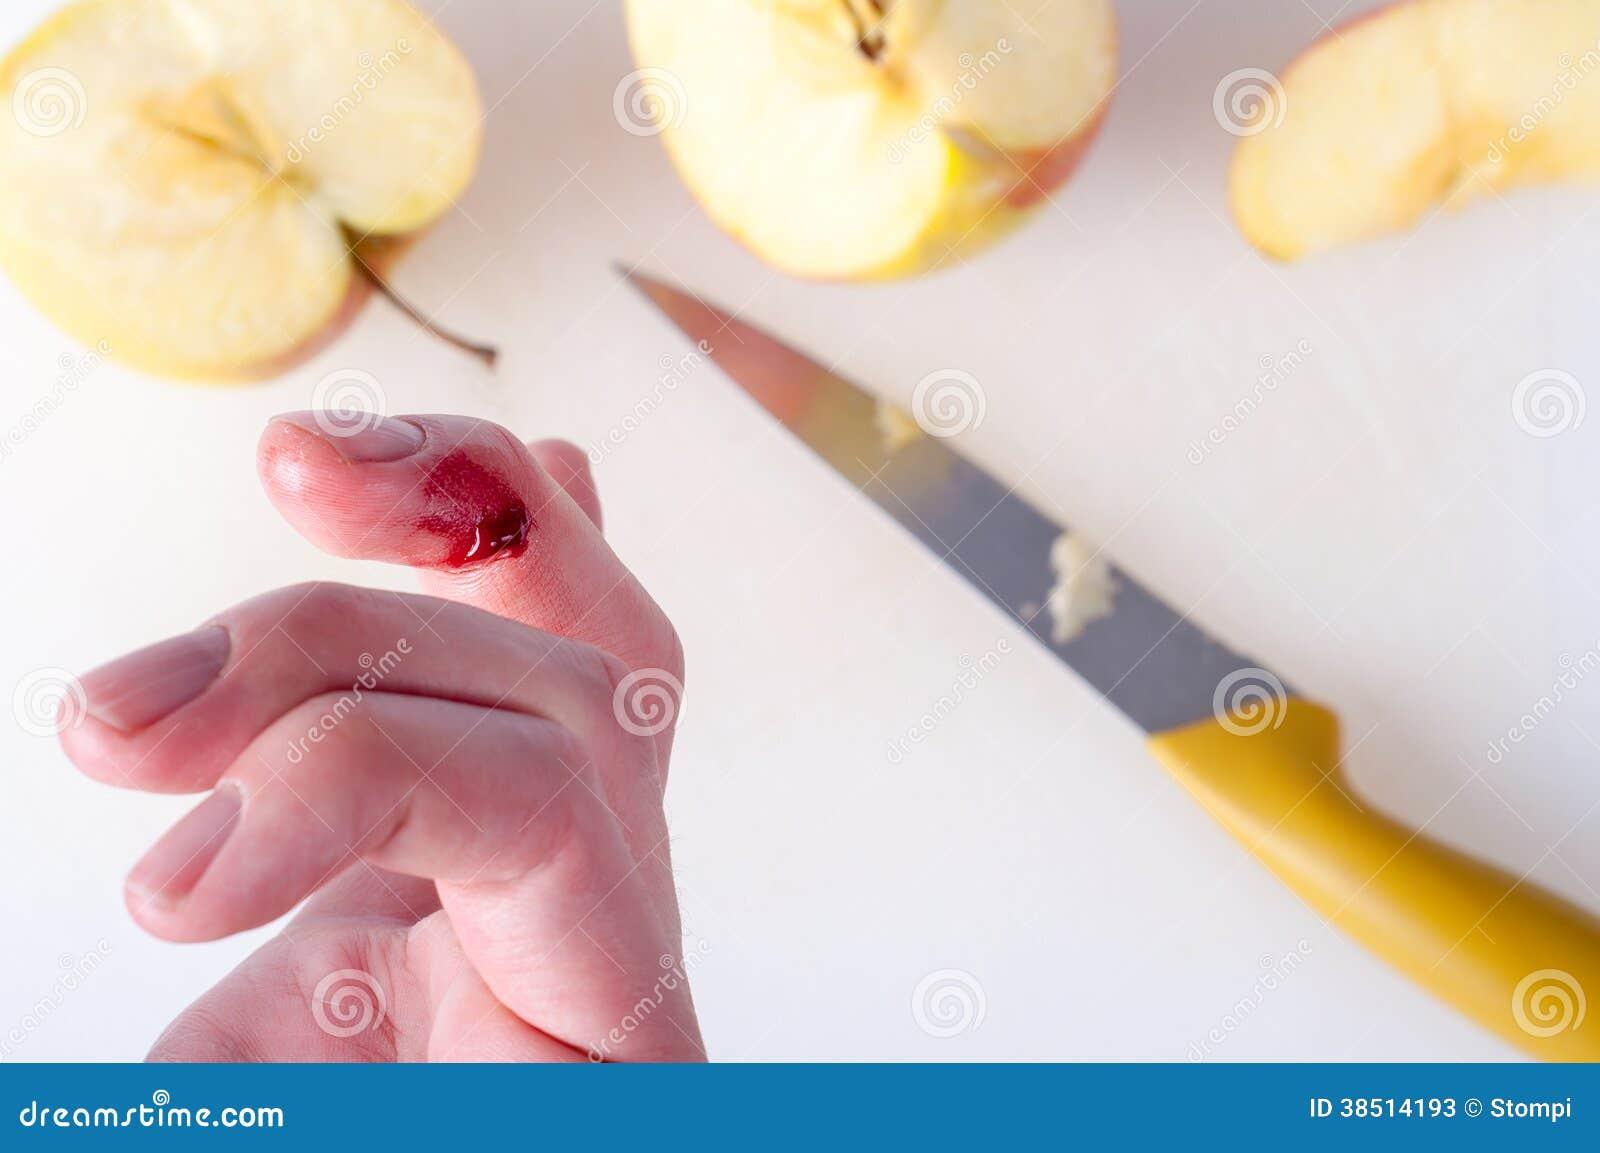 Finger Cut Stock Photos